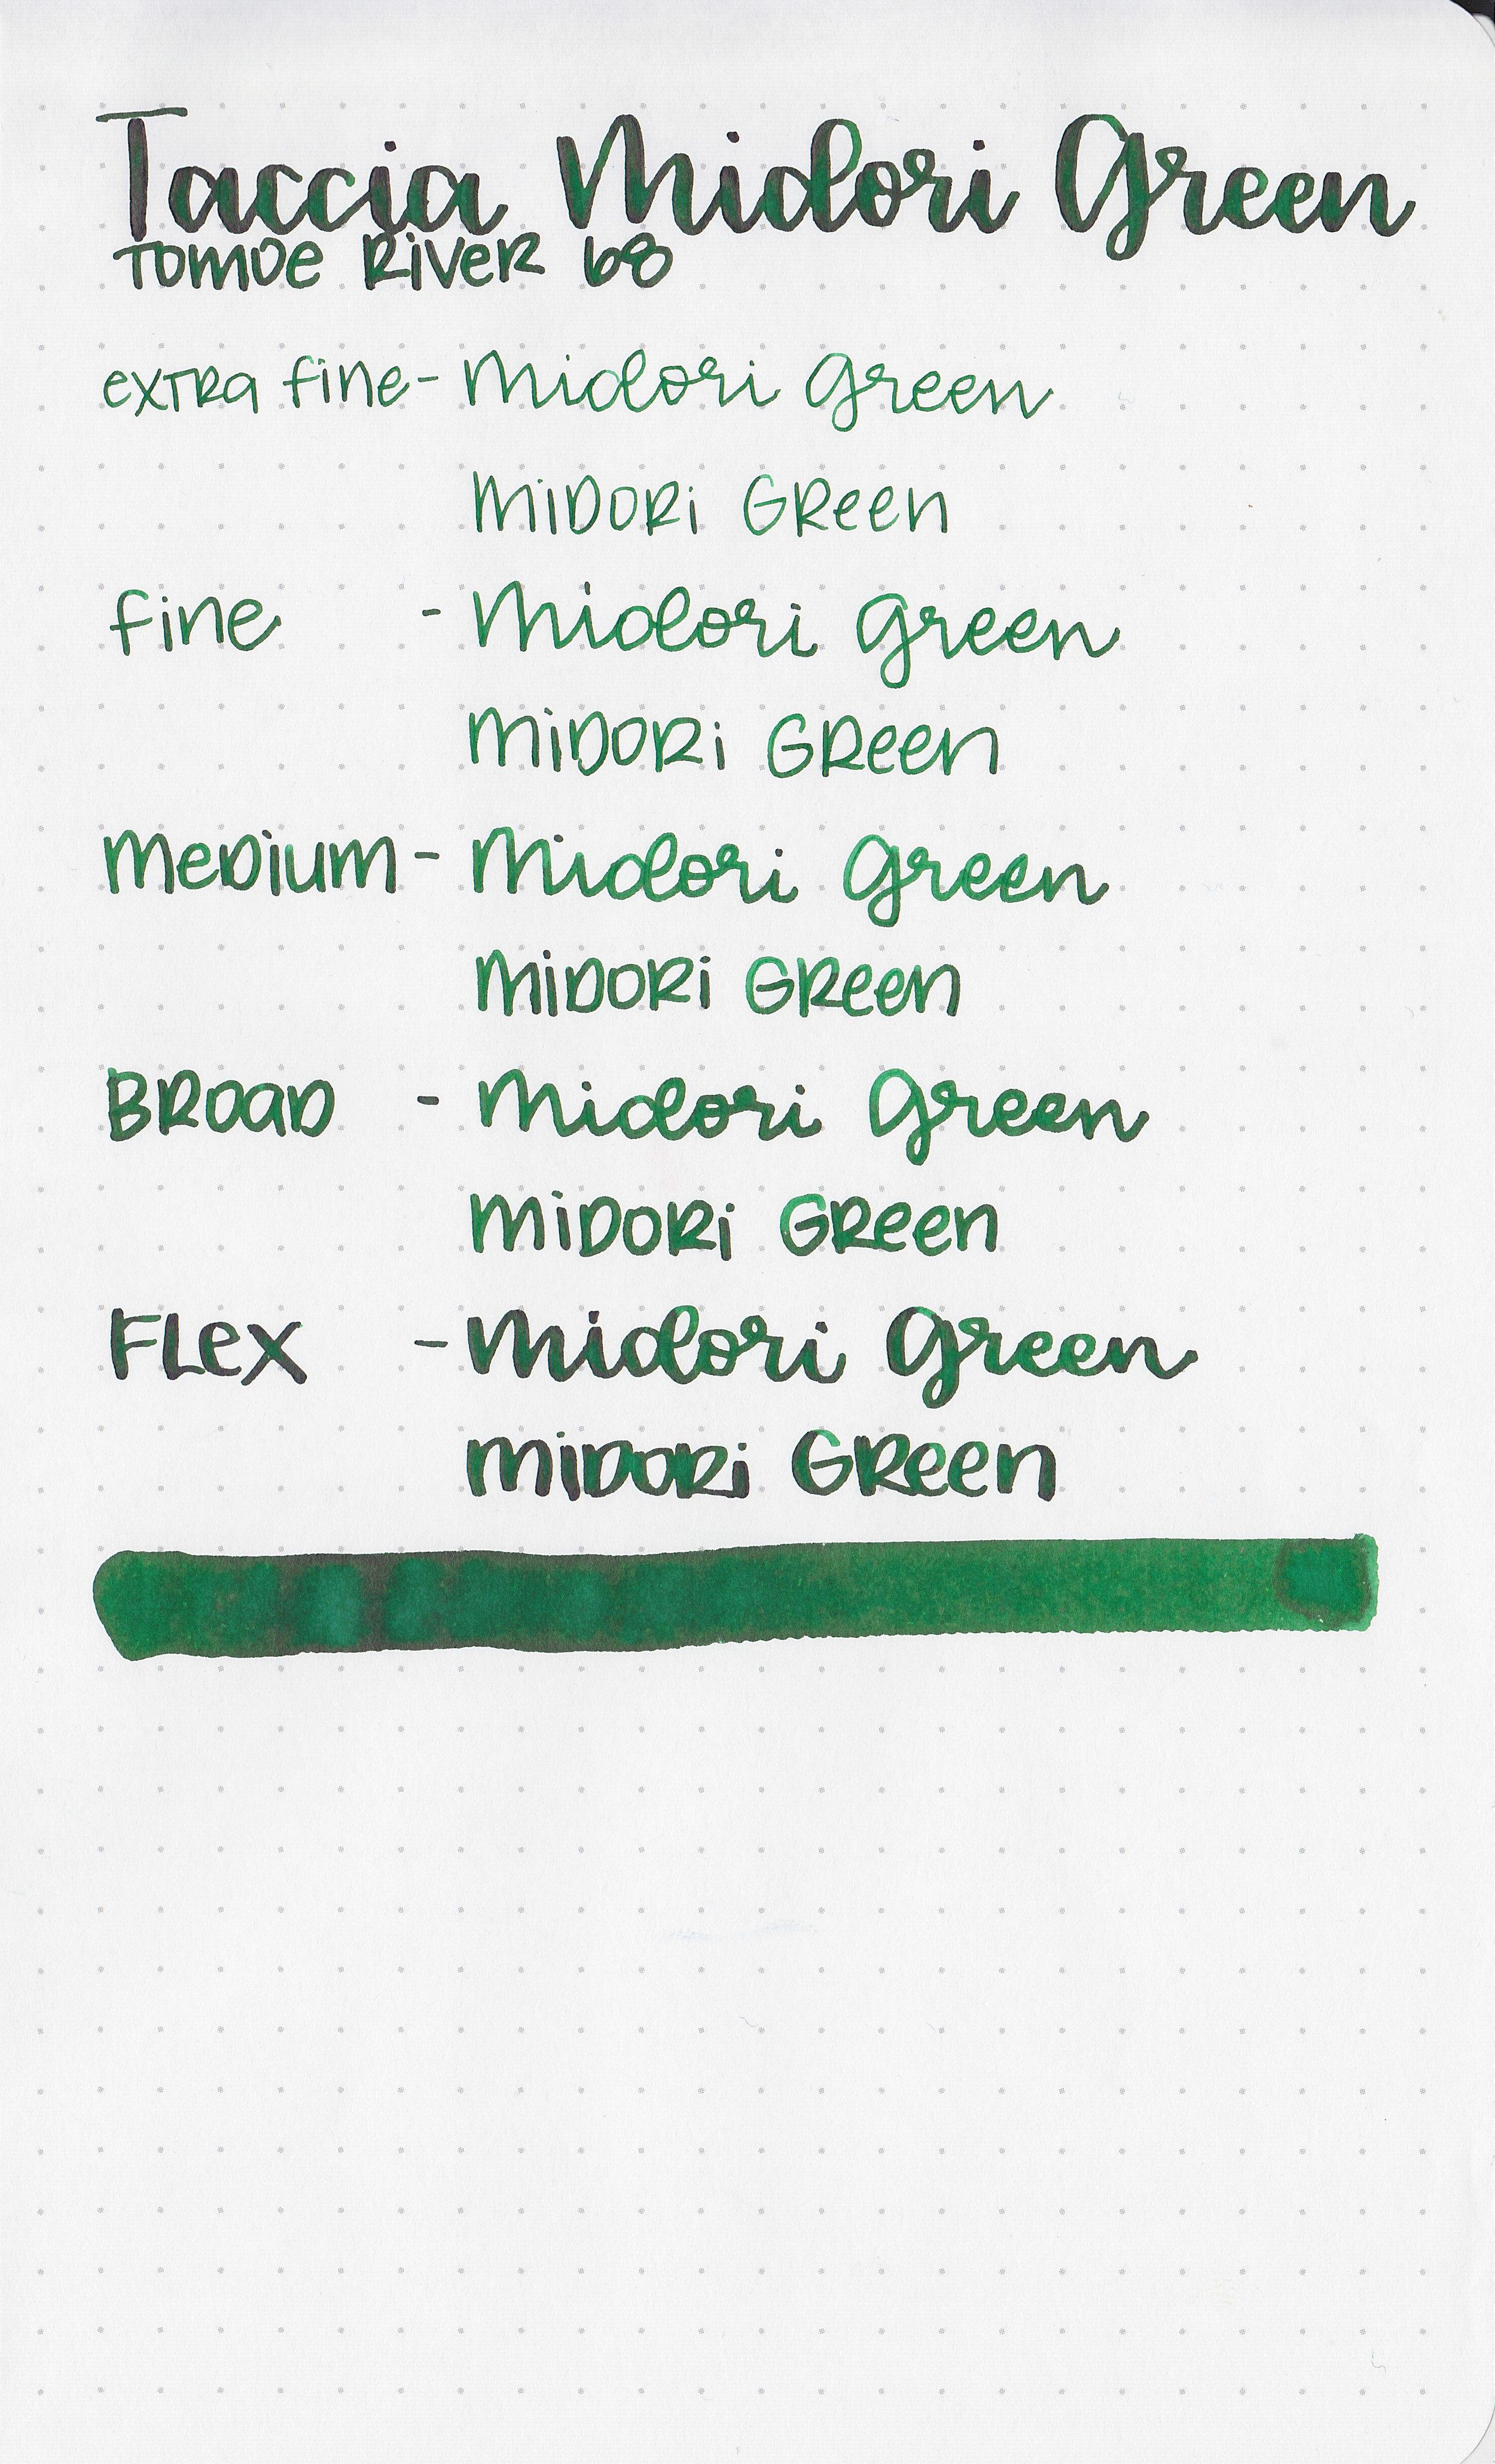 tac-midori-green-7.jpg